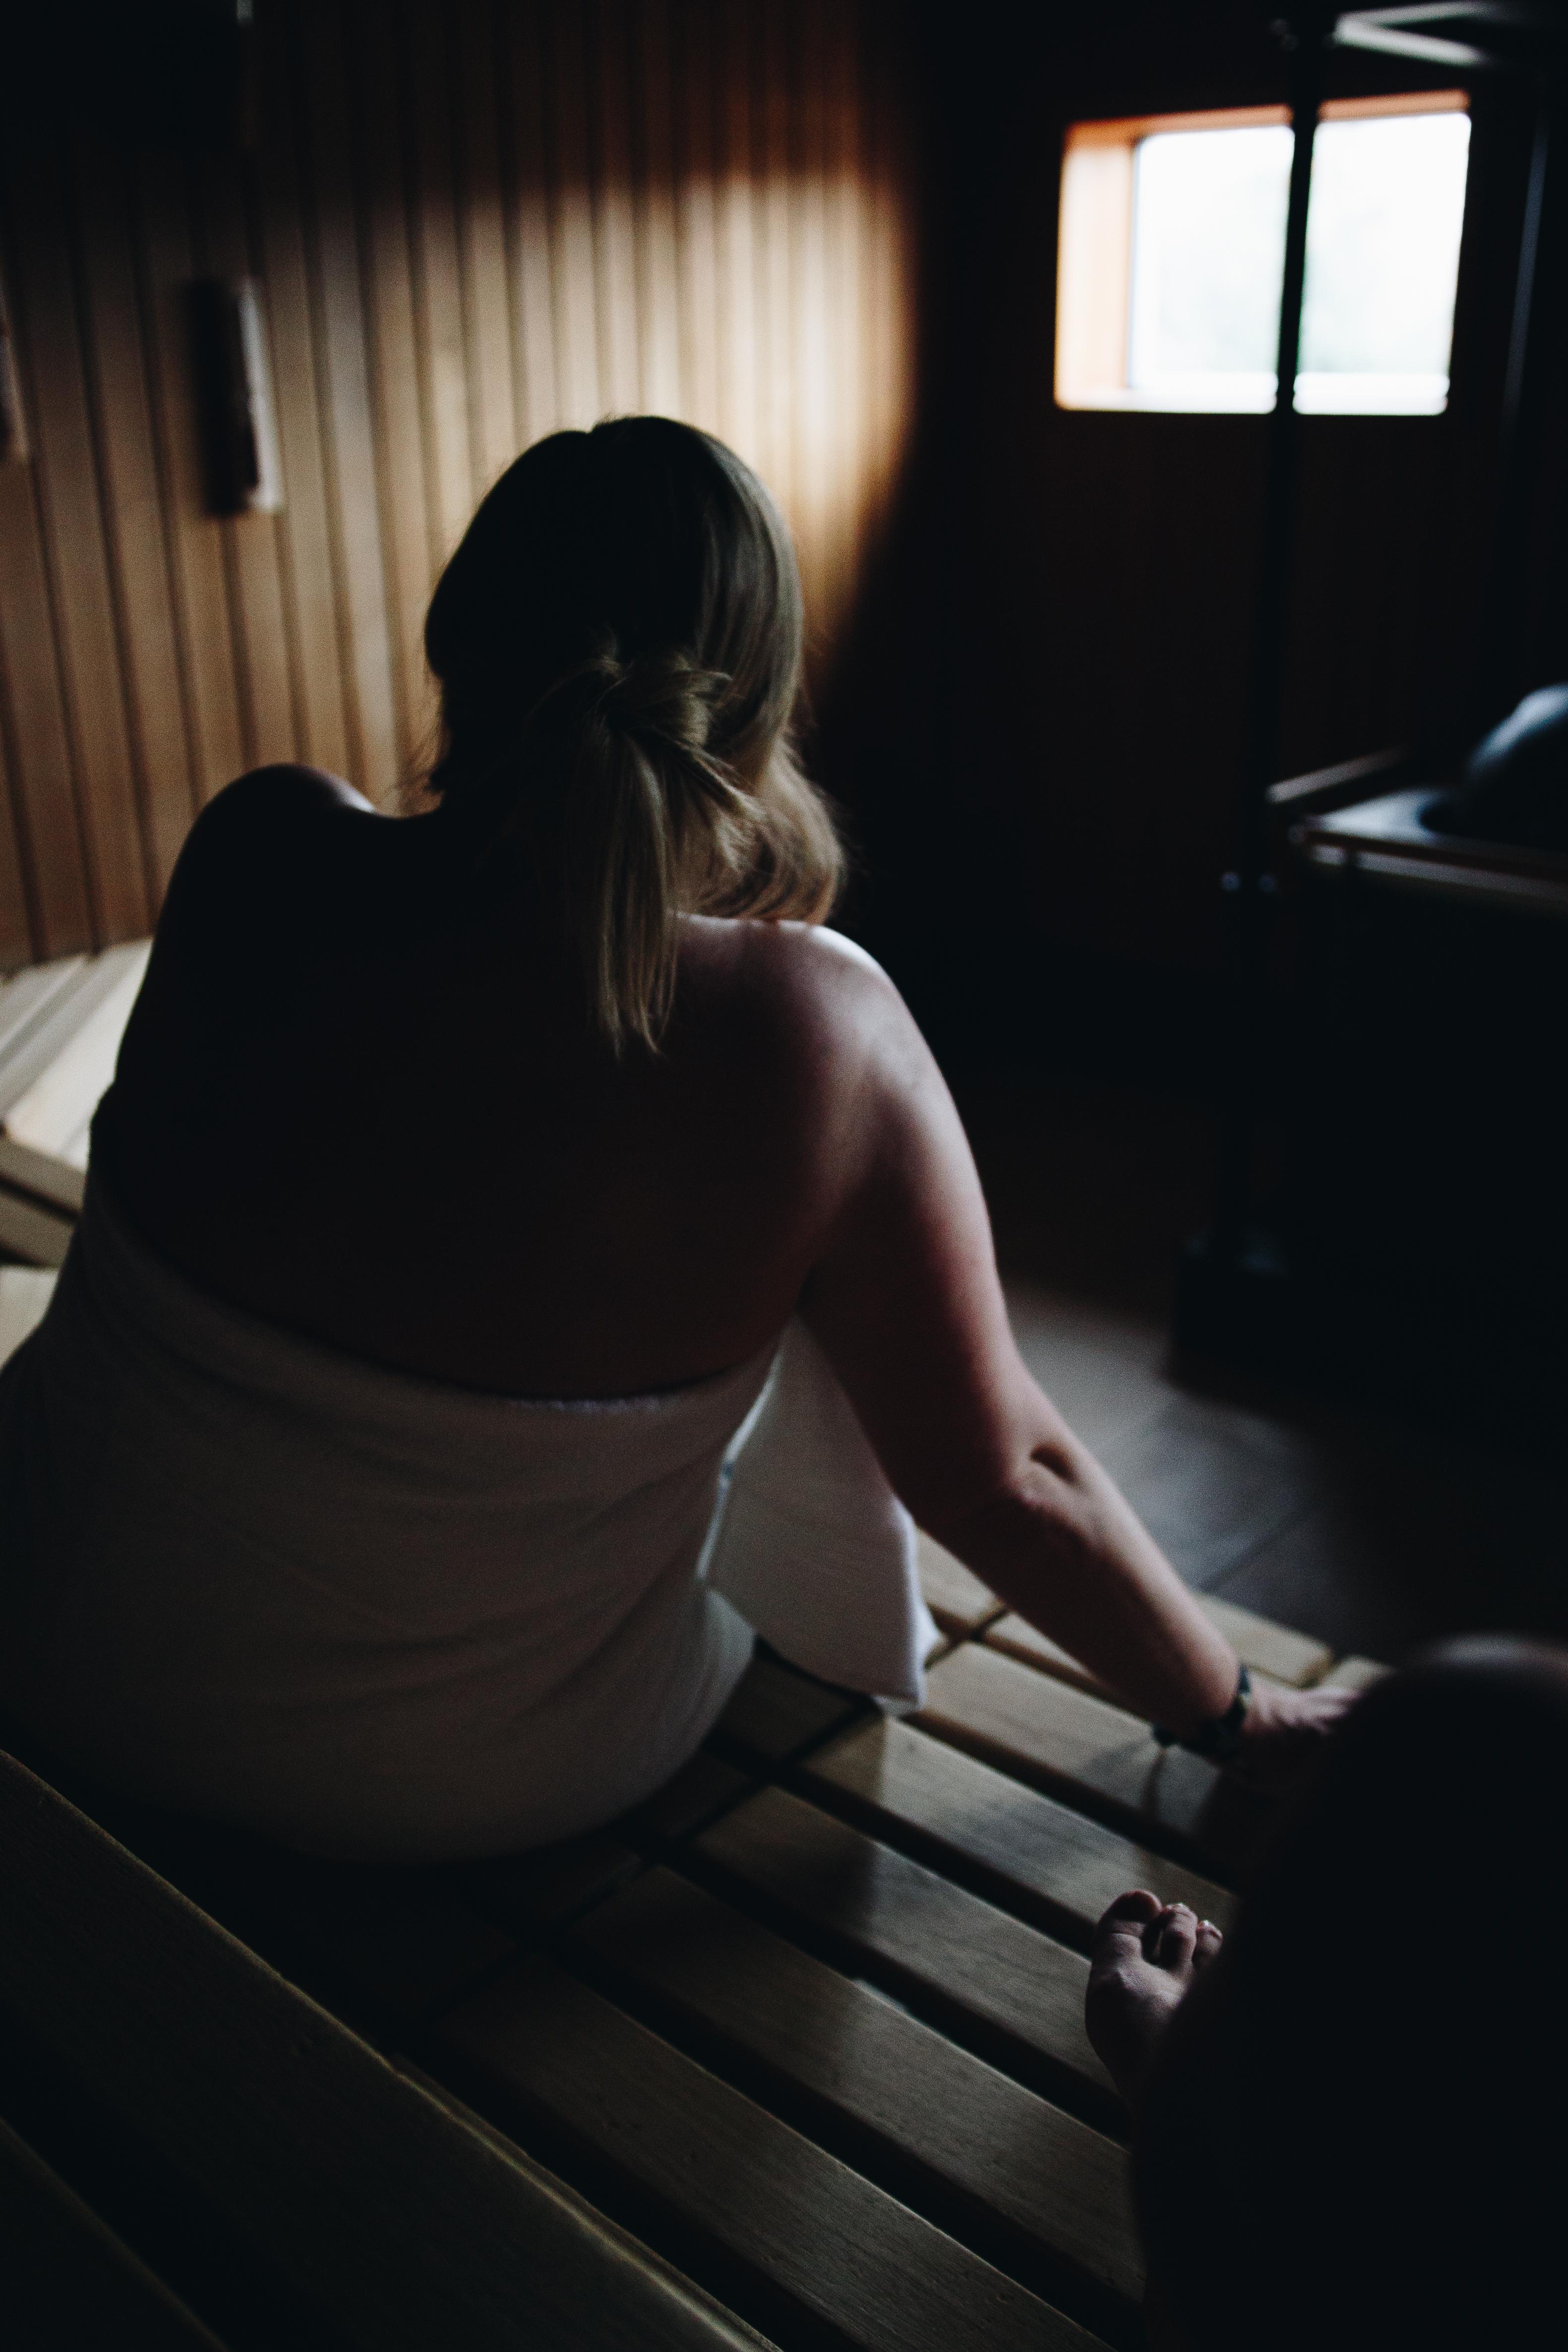 meri sauna-annabelle sagt-leipzig30